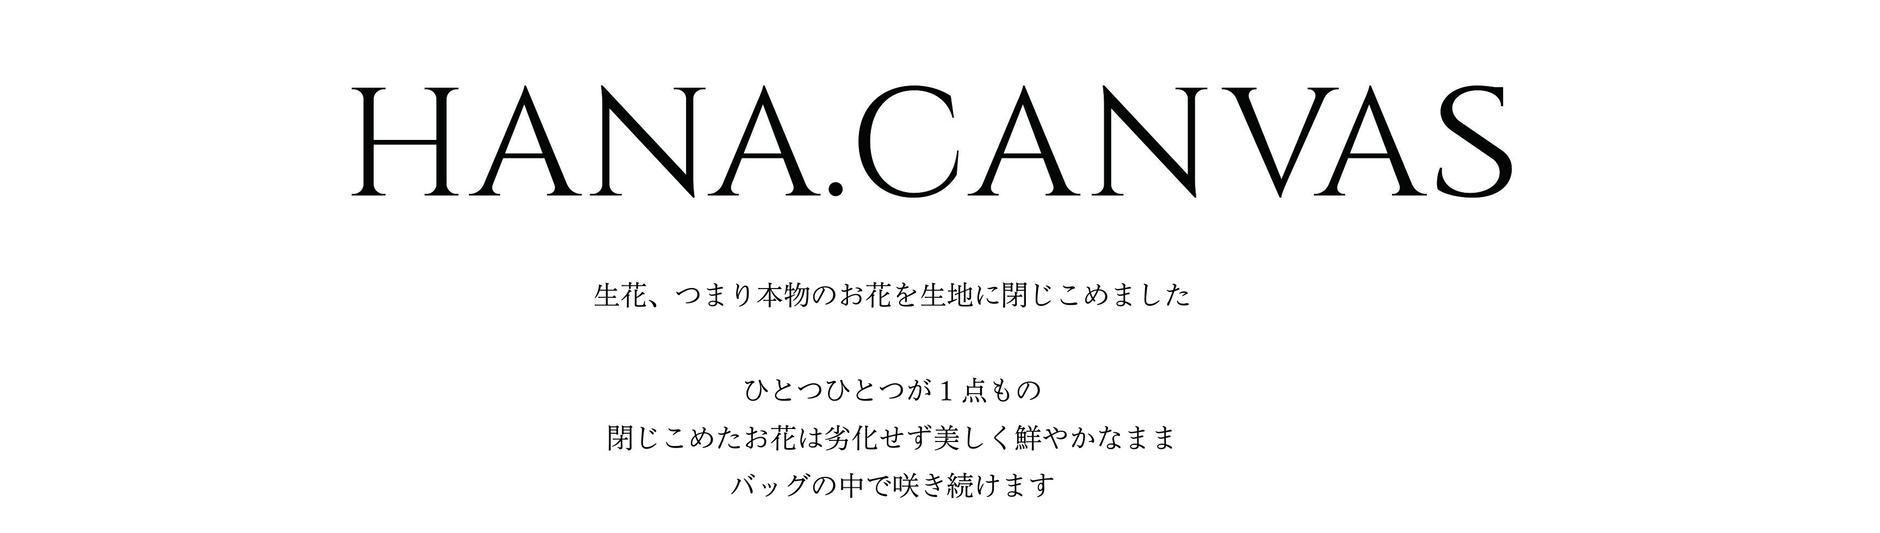 HANA.CANVAS-colore